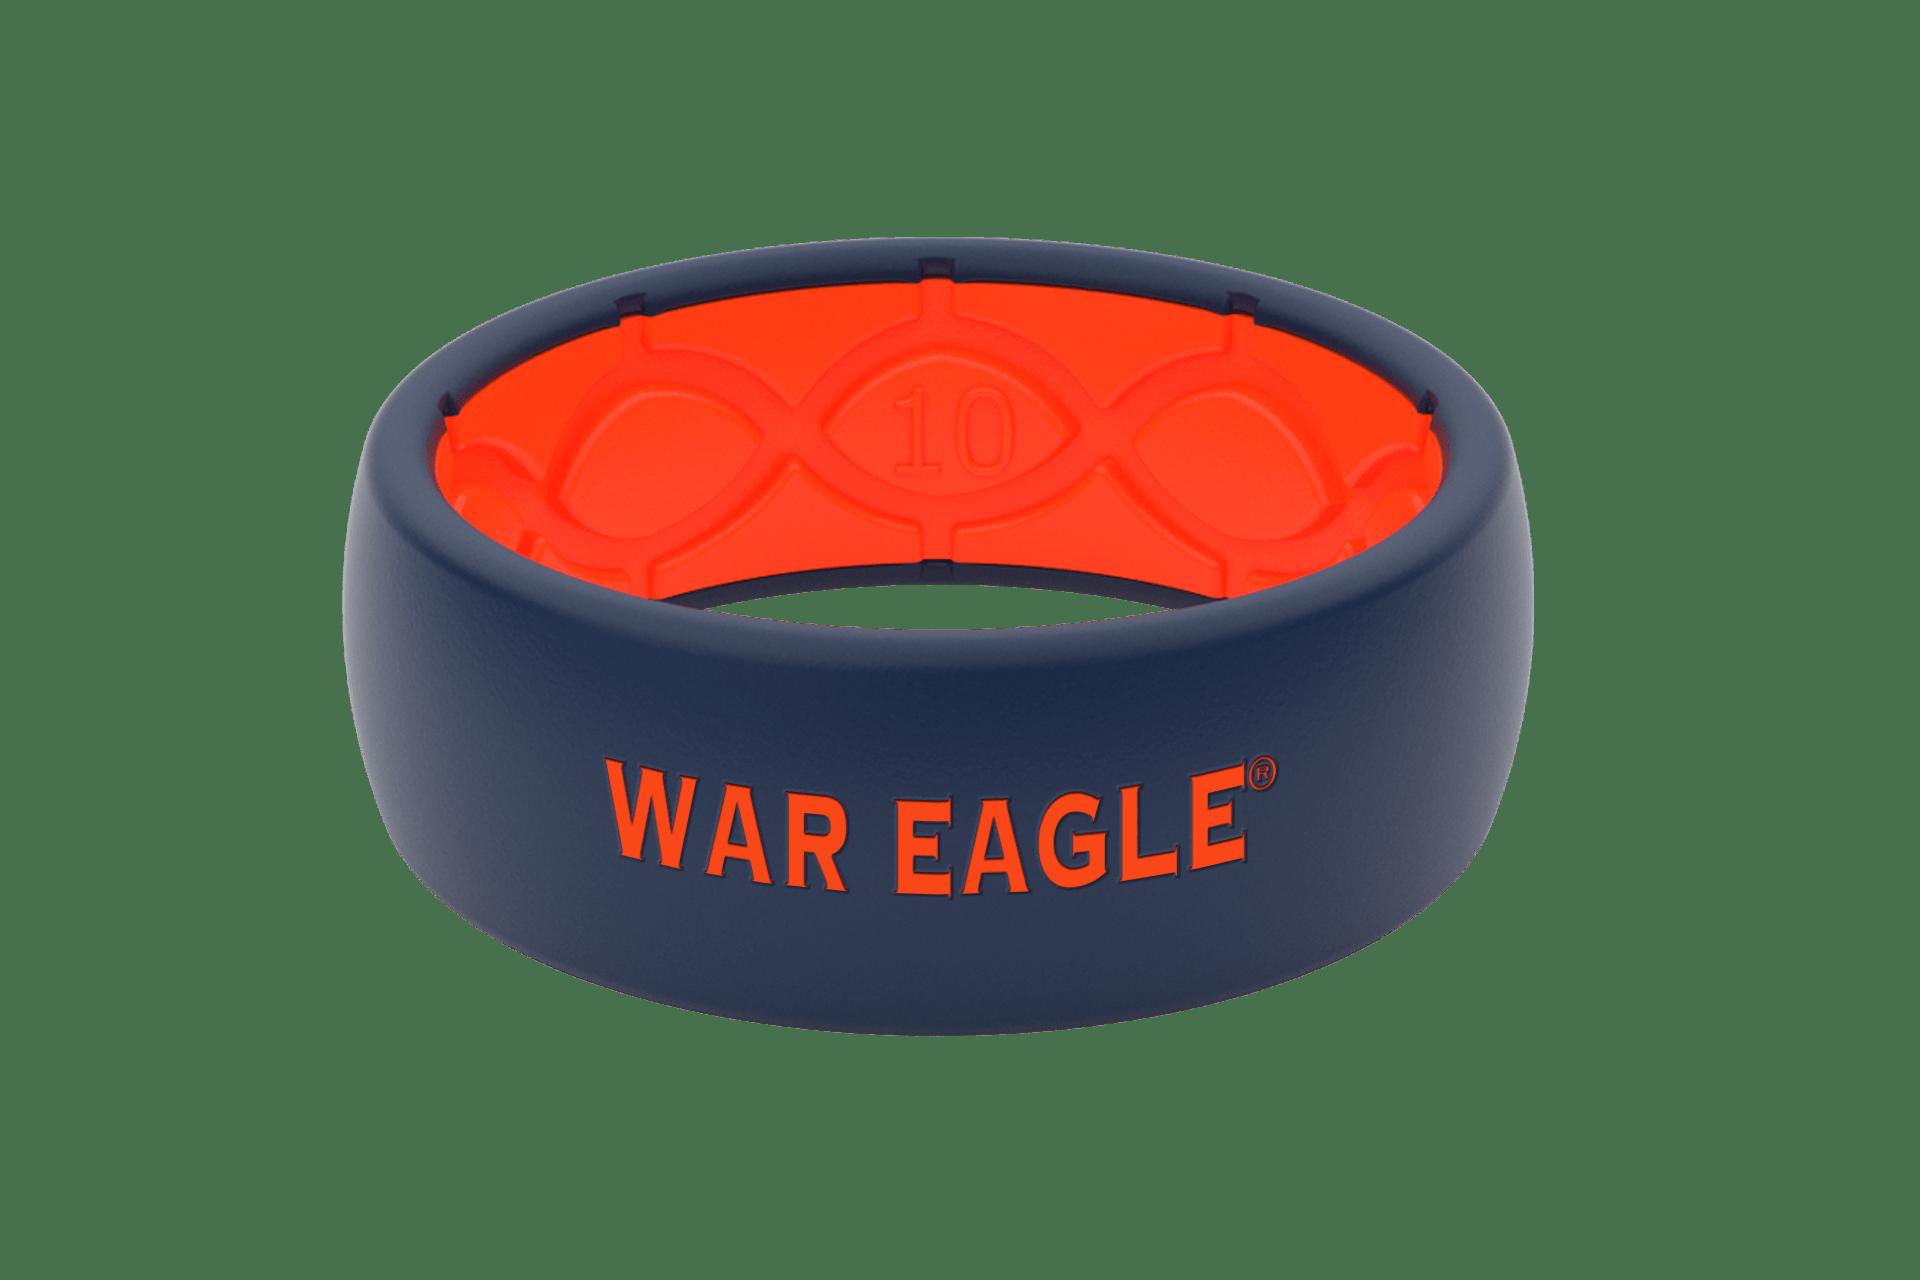 Original College Auburn War Eagle  viewed front on